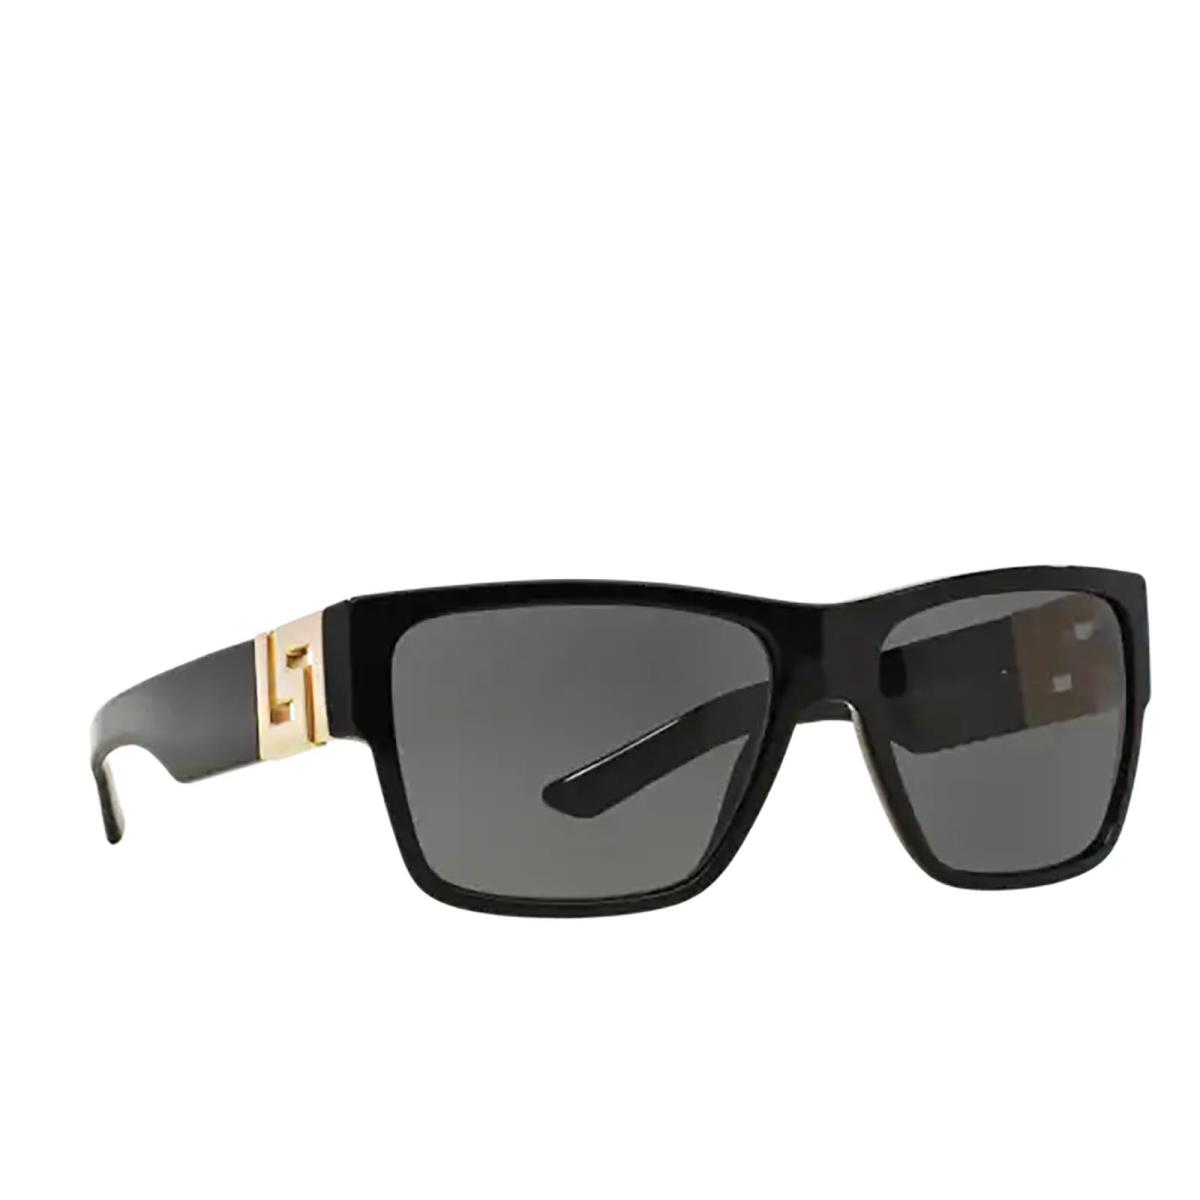 Versace® Square Sunglasses: VE4296 color Black GB1/87.